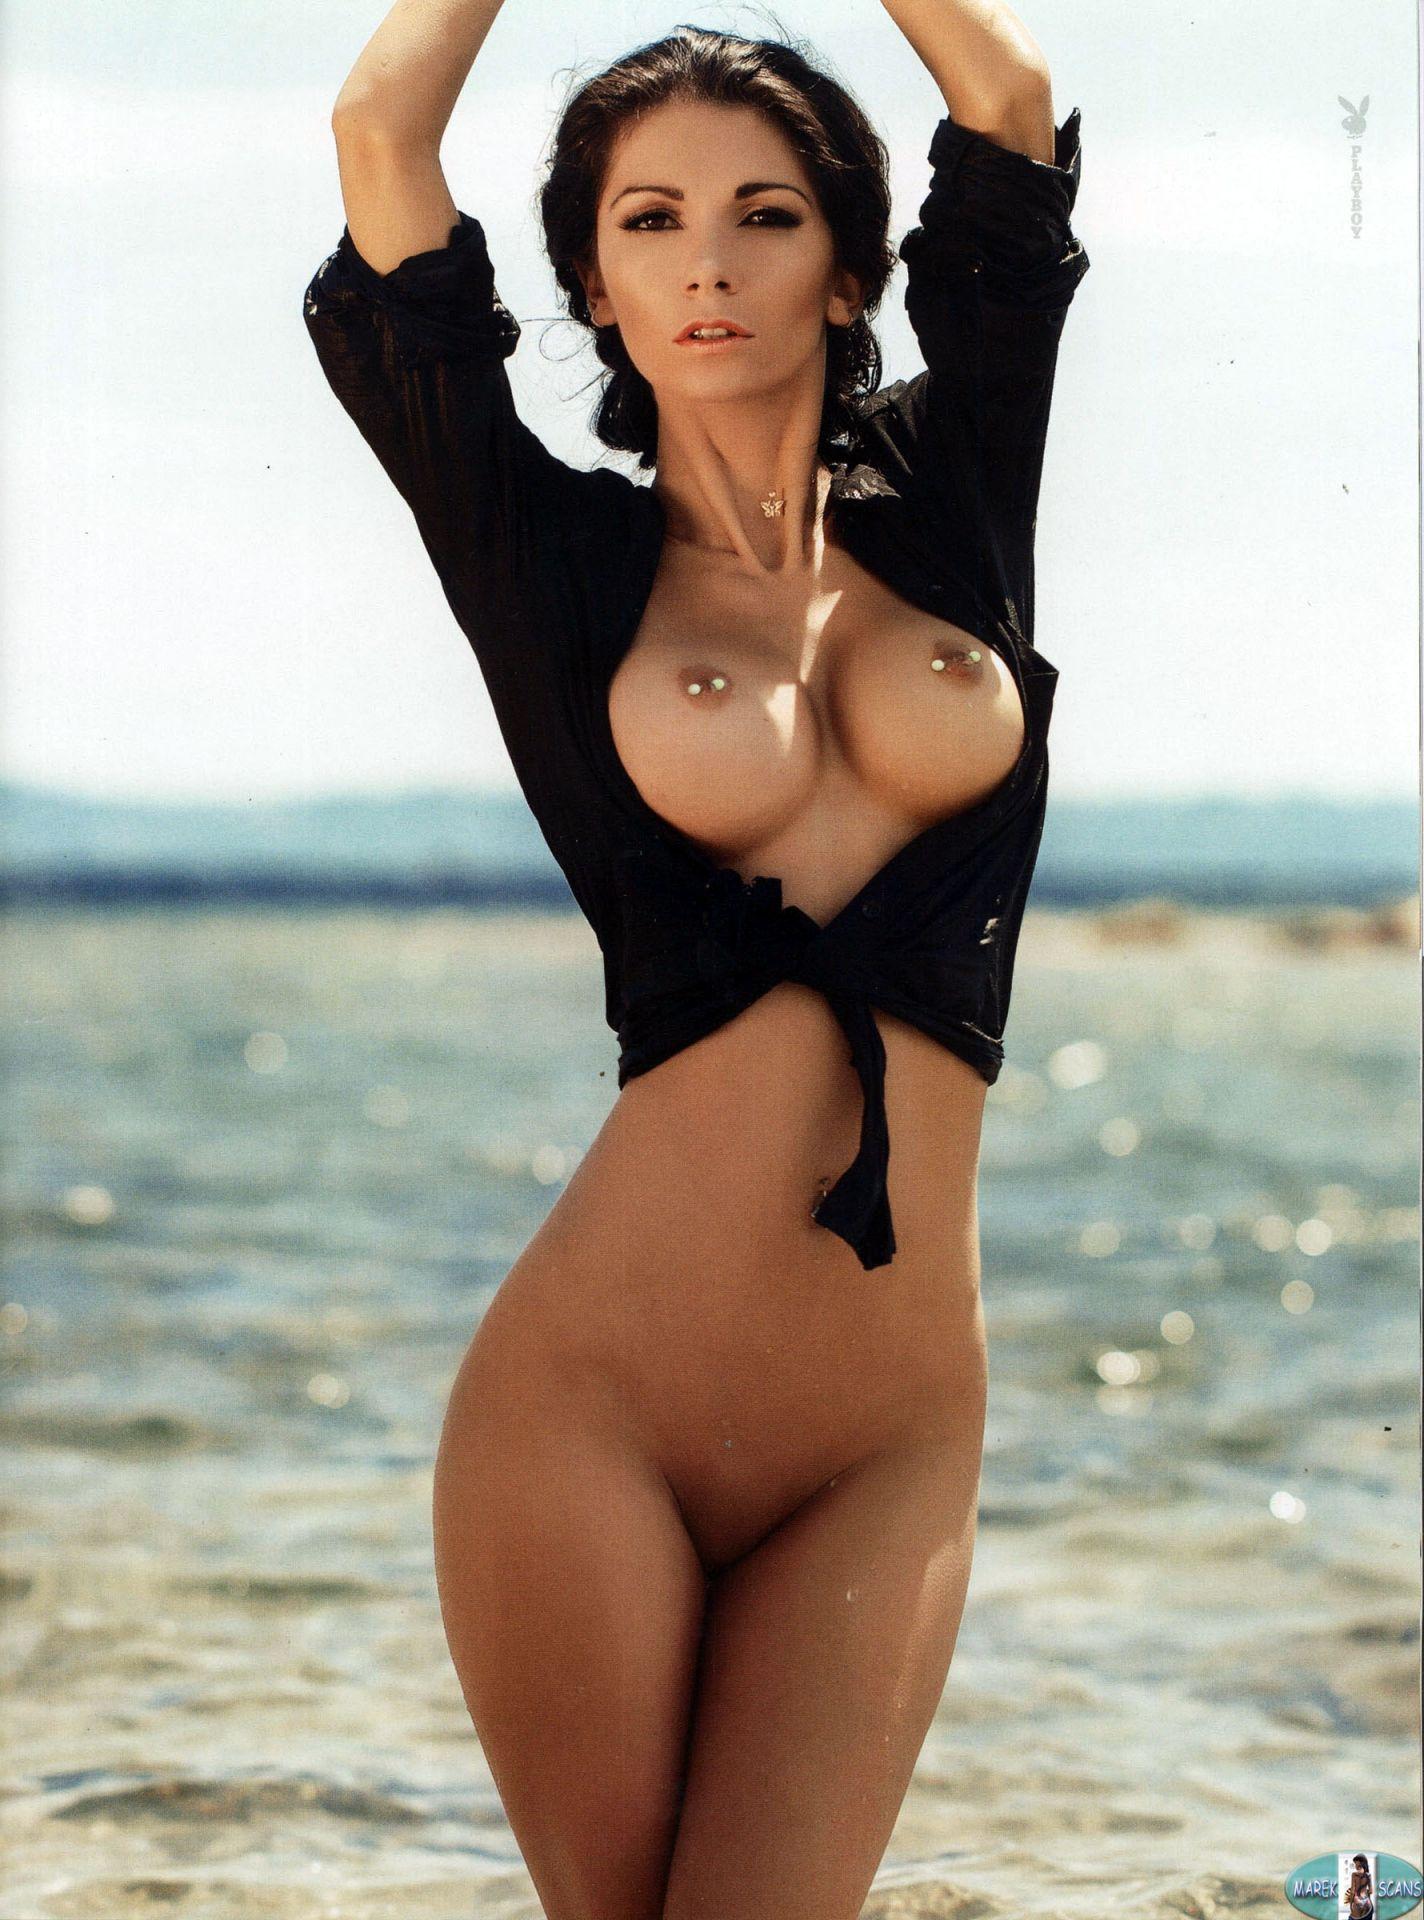 Nudes pictures of kristine reyes, free porn tube analt massage